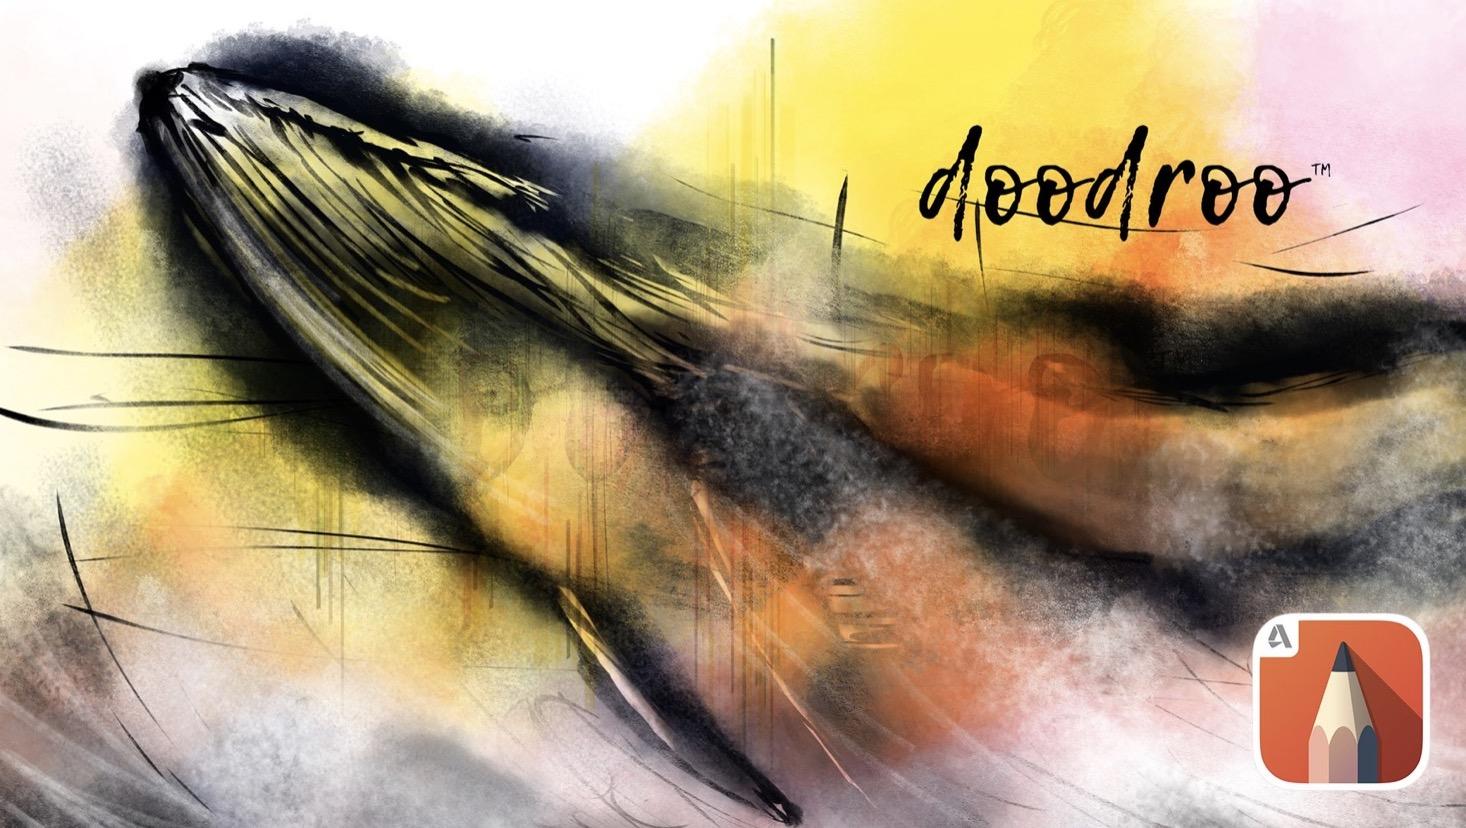 Recensione Doodroo, la pellicola per iPad e Apple Pencil vista da un artista